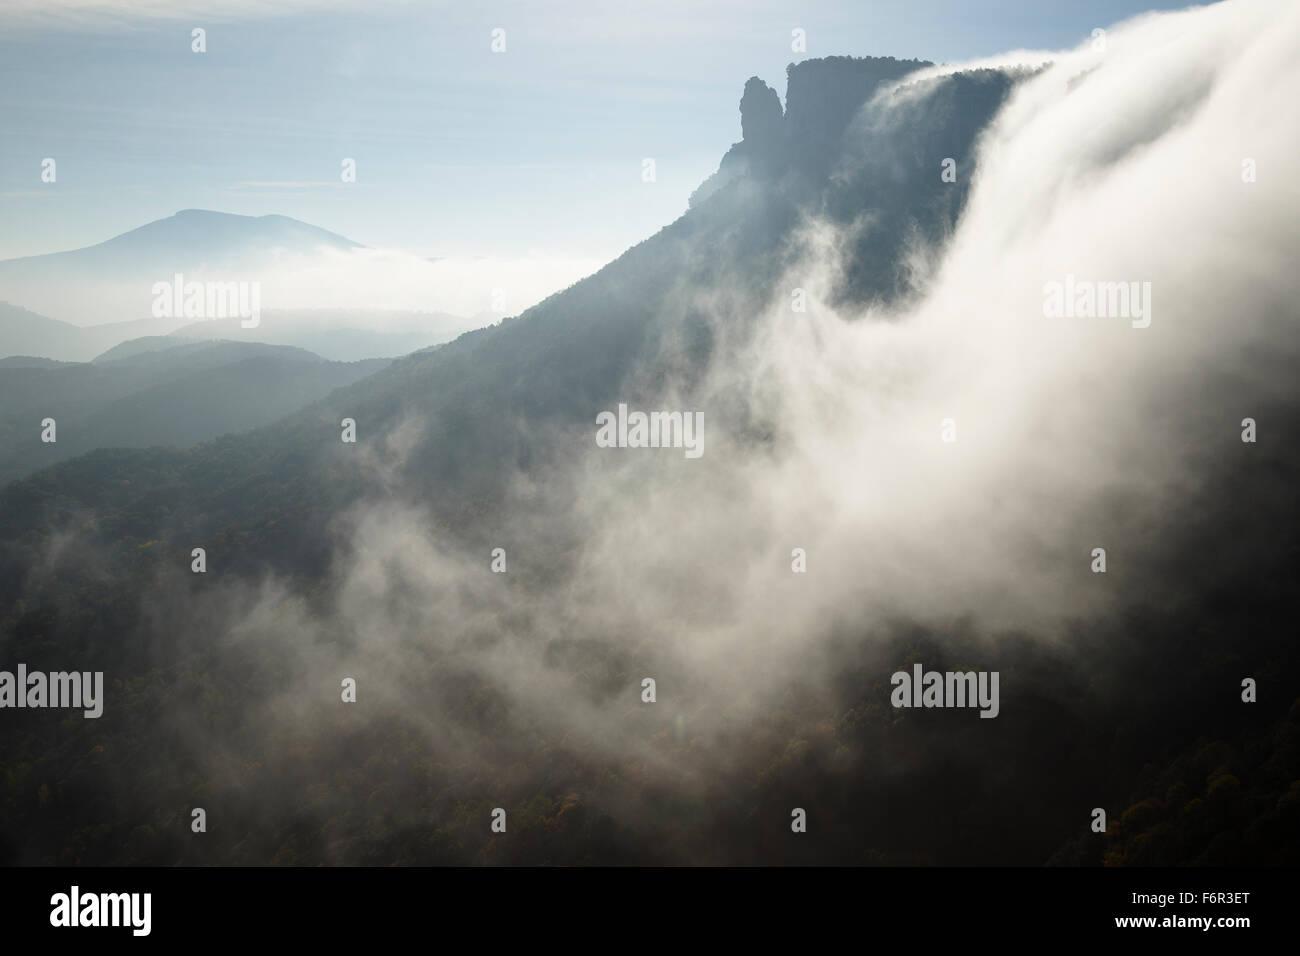 Nebel. Salz Sallent Wasserfall. Rupit. Osona Region. Barcelona. Cataluña. Spanien. Europa Stockbild